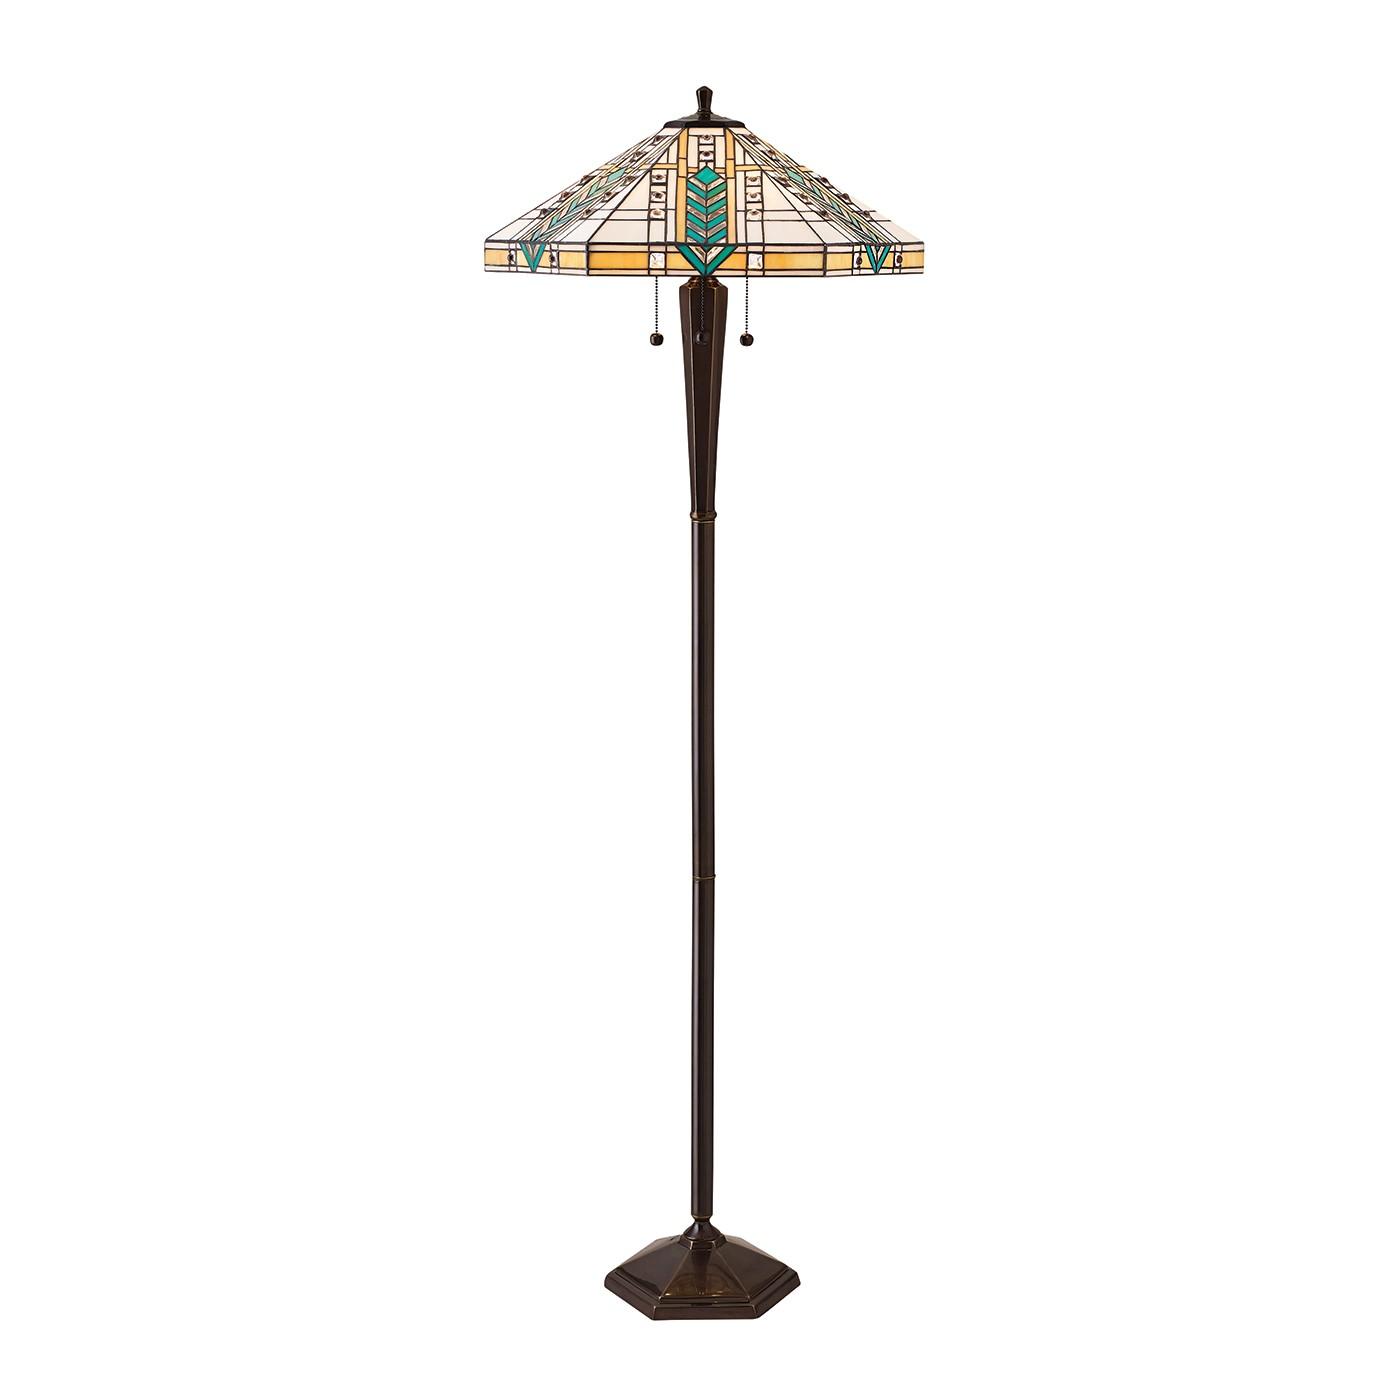 lloyd 70667 tiffany down 3 light floor lamp lighting bug swindon. Black Bedroom Furniture Sets. Home Design Ideas